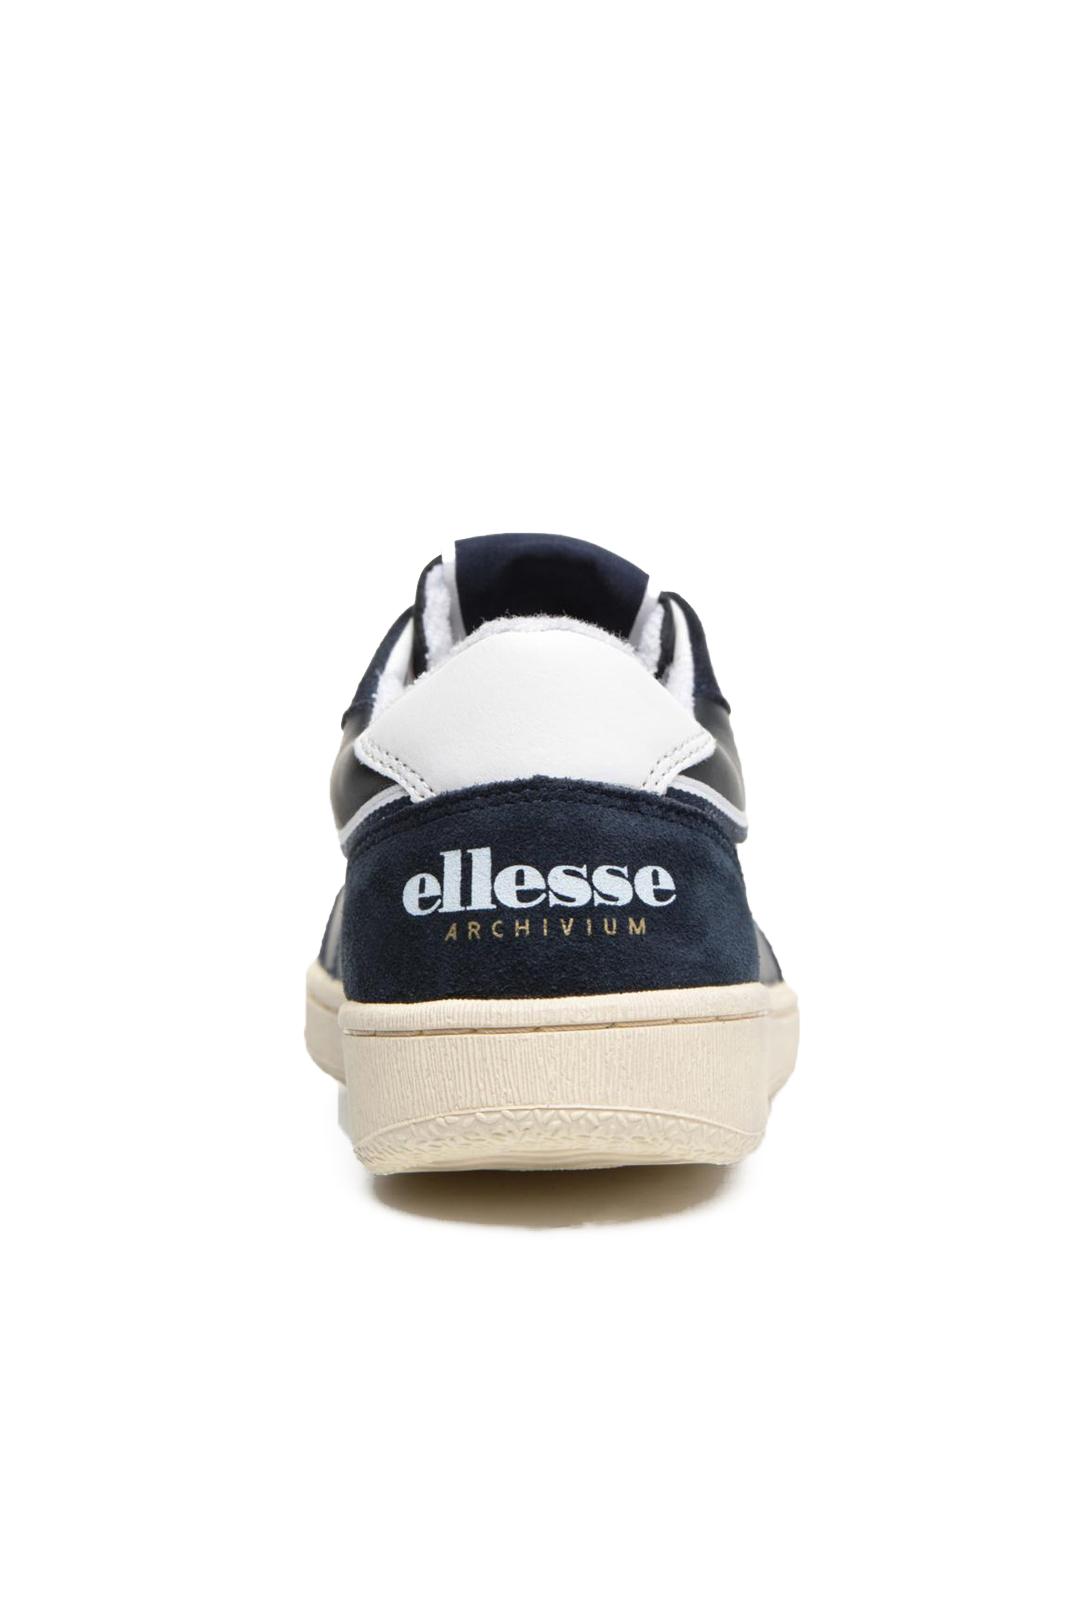 Baskets / Sport  Ellesse EL82440 H 02 DEEP WHITE